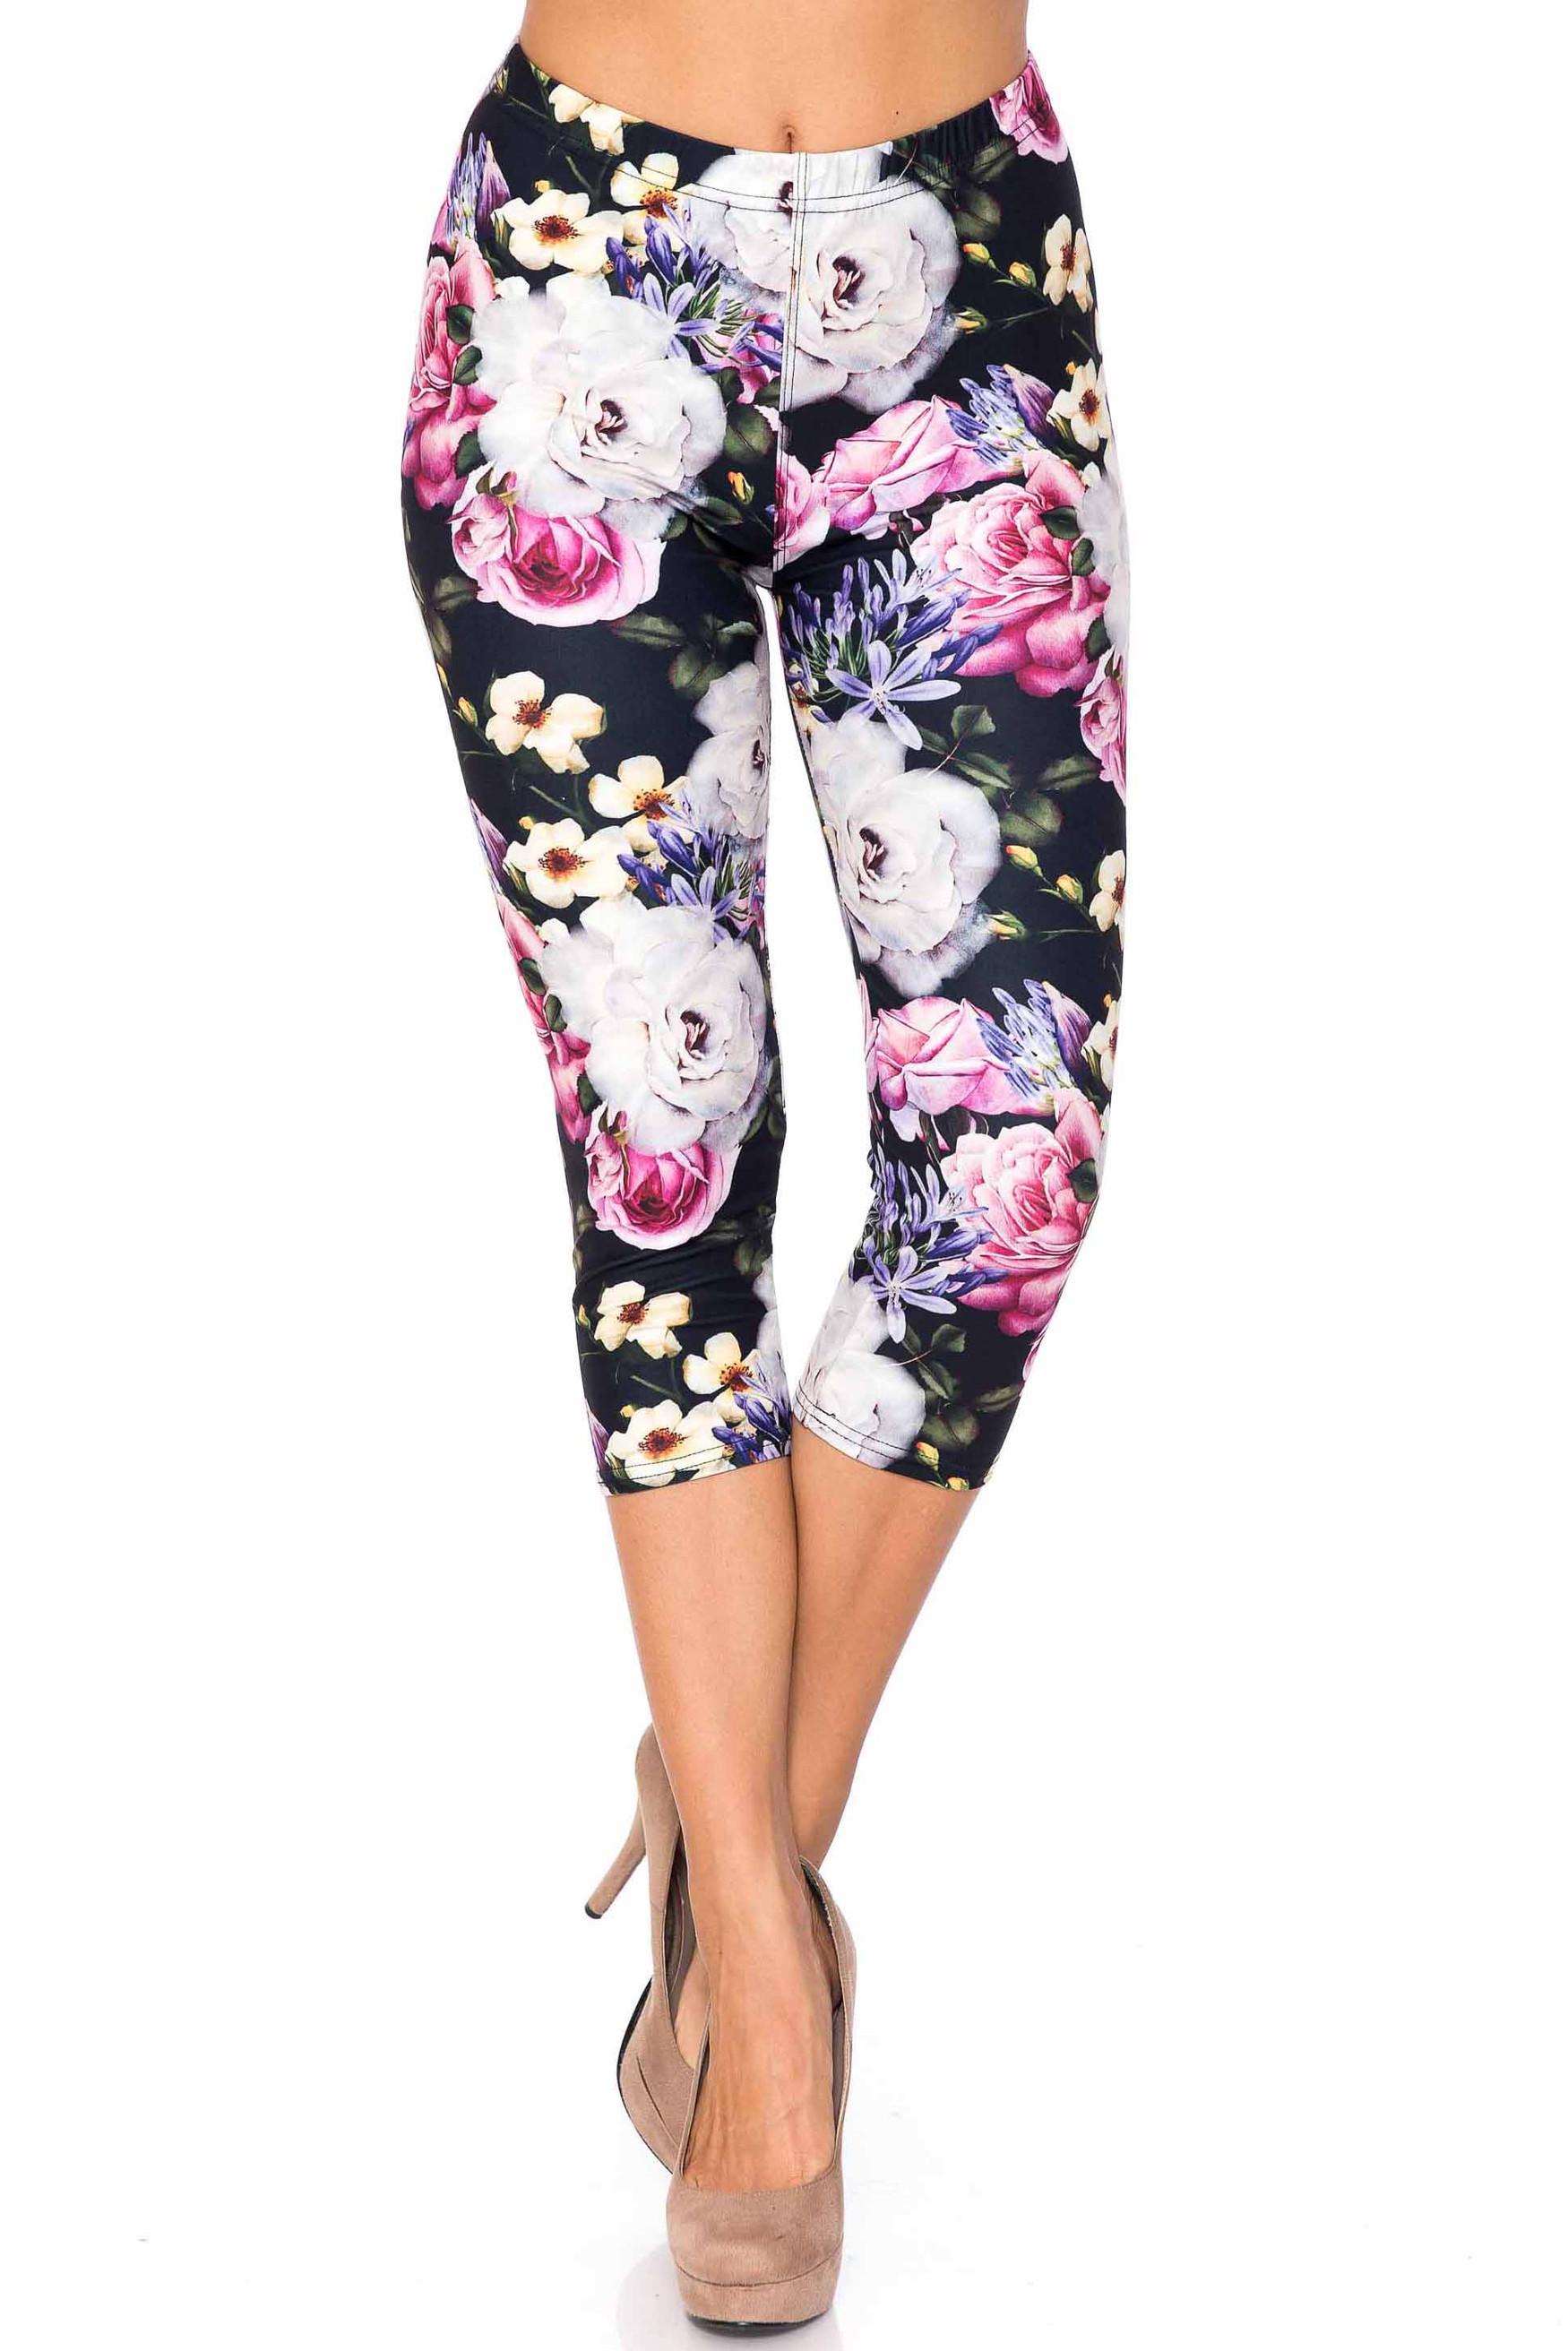 Creamy Soft Floral Garden Bouquet Extra Plus Size Capris - 3X-5X - USA Fashion™